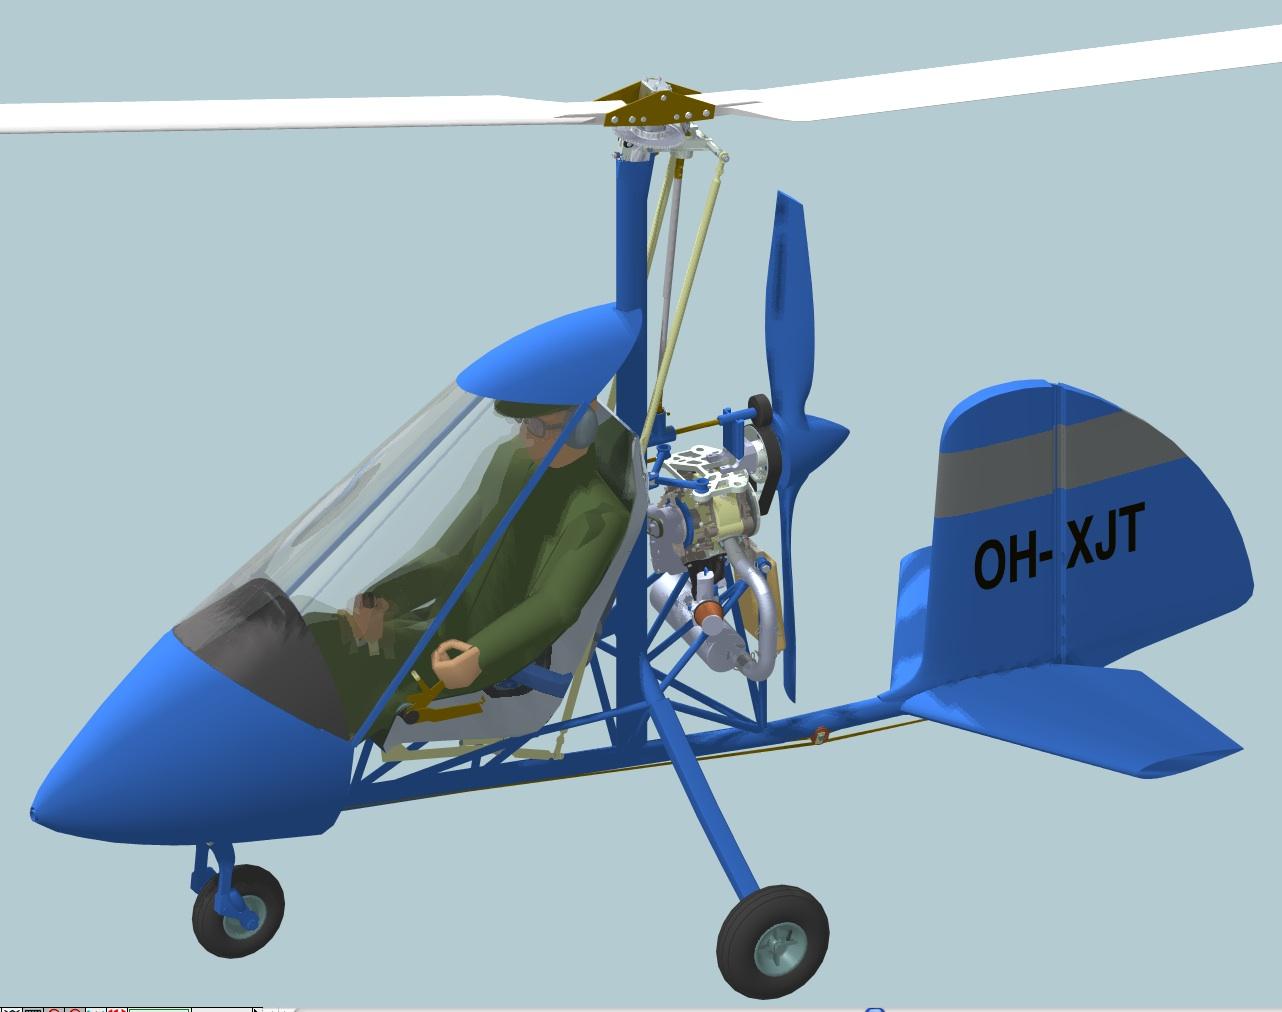 JT-11 Autogyro